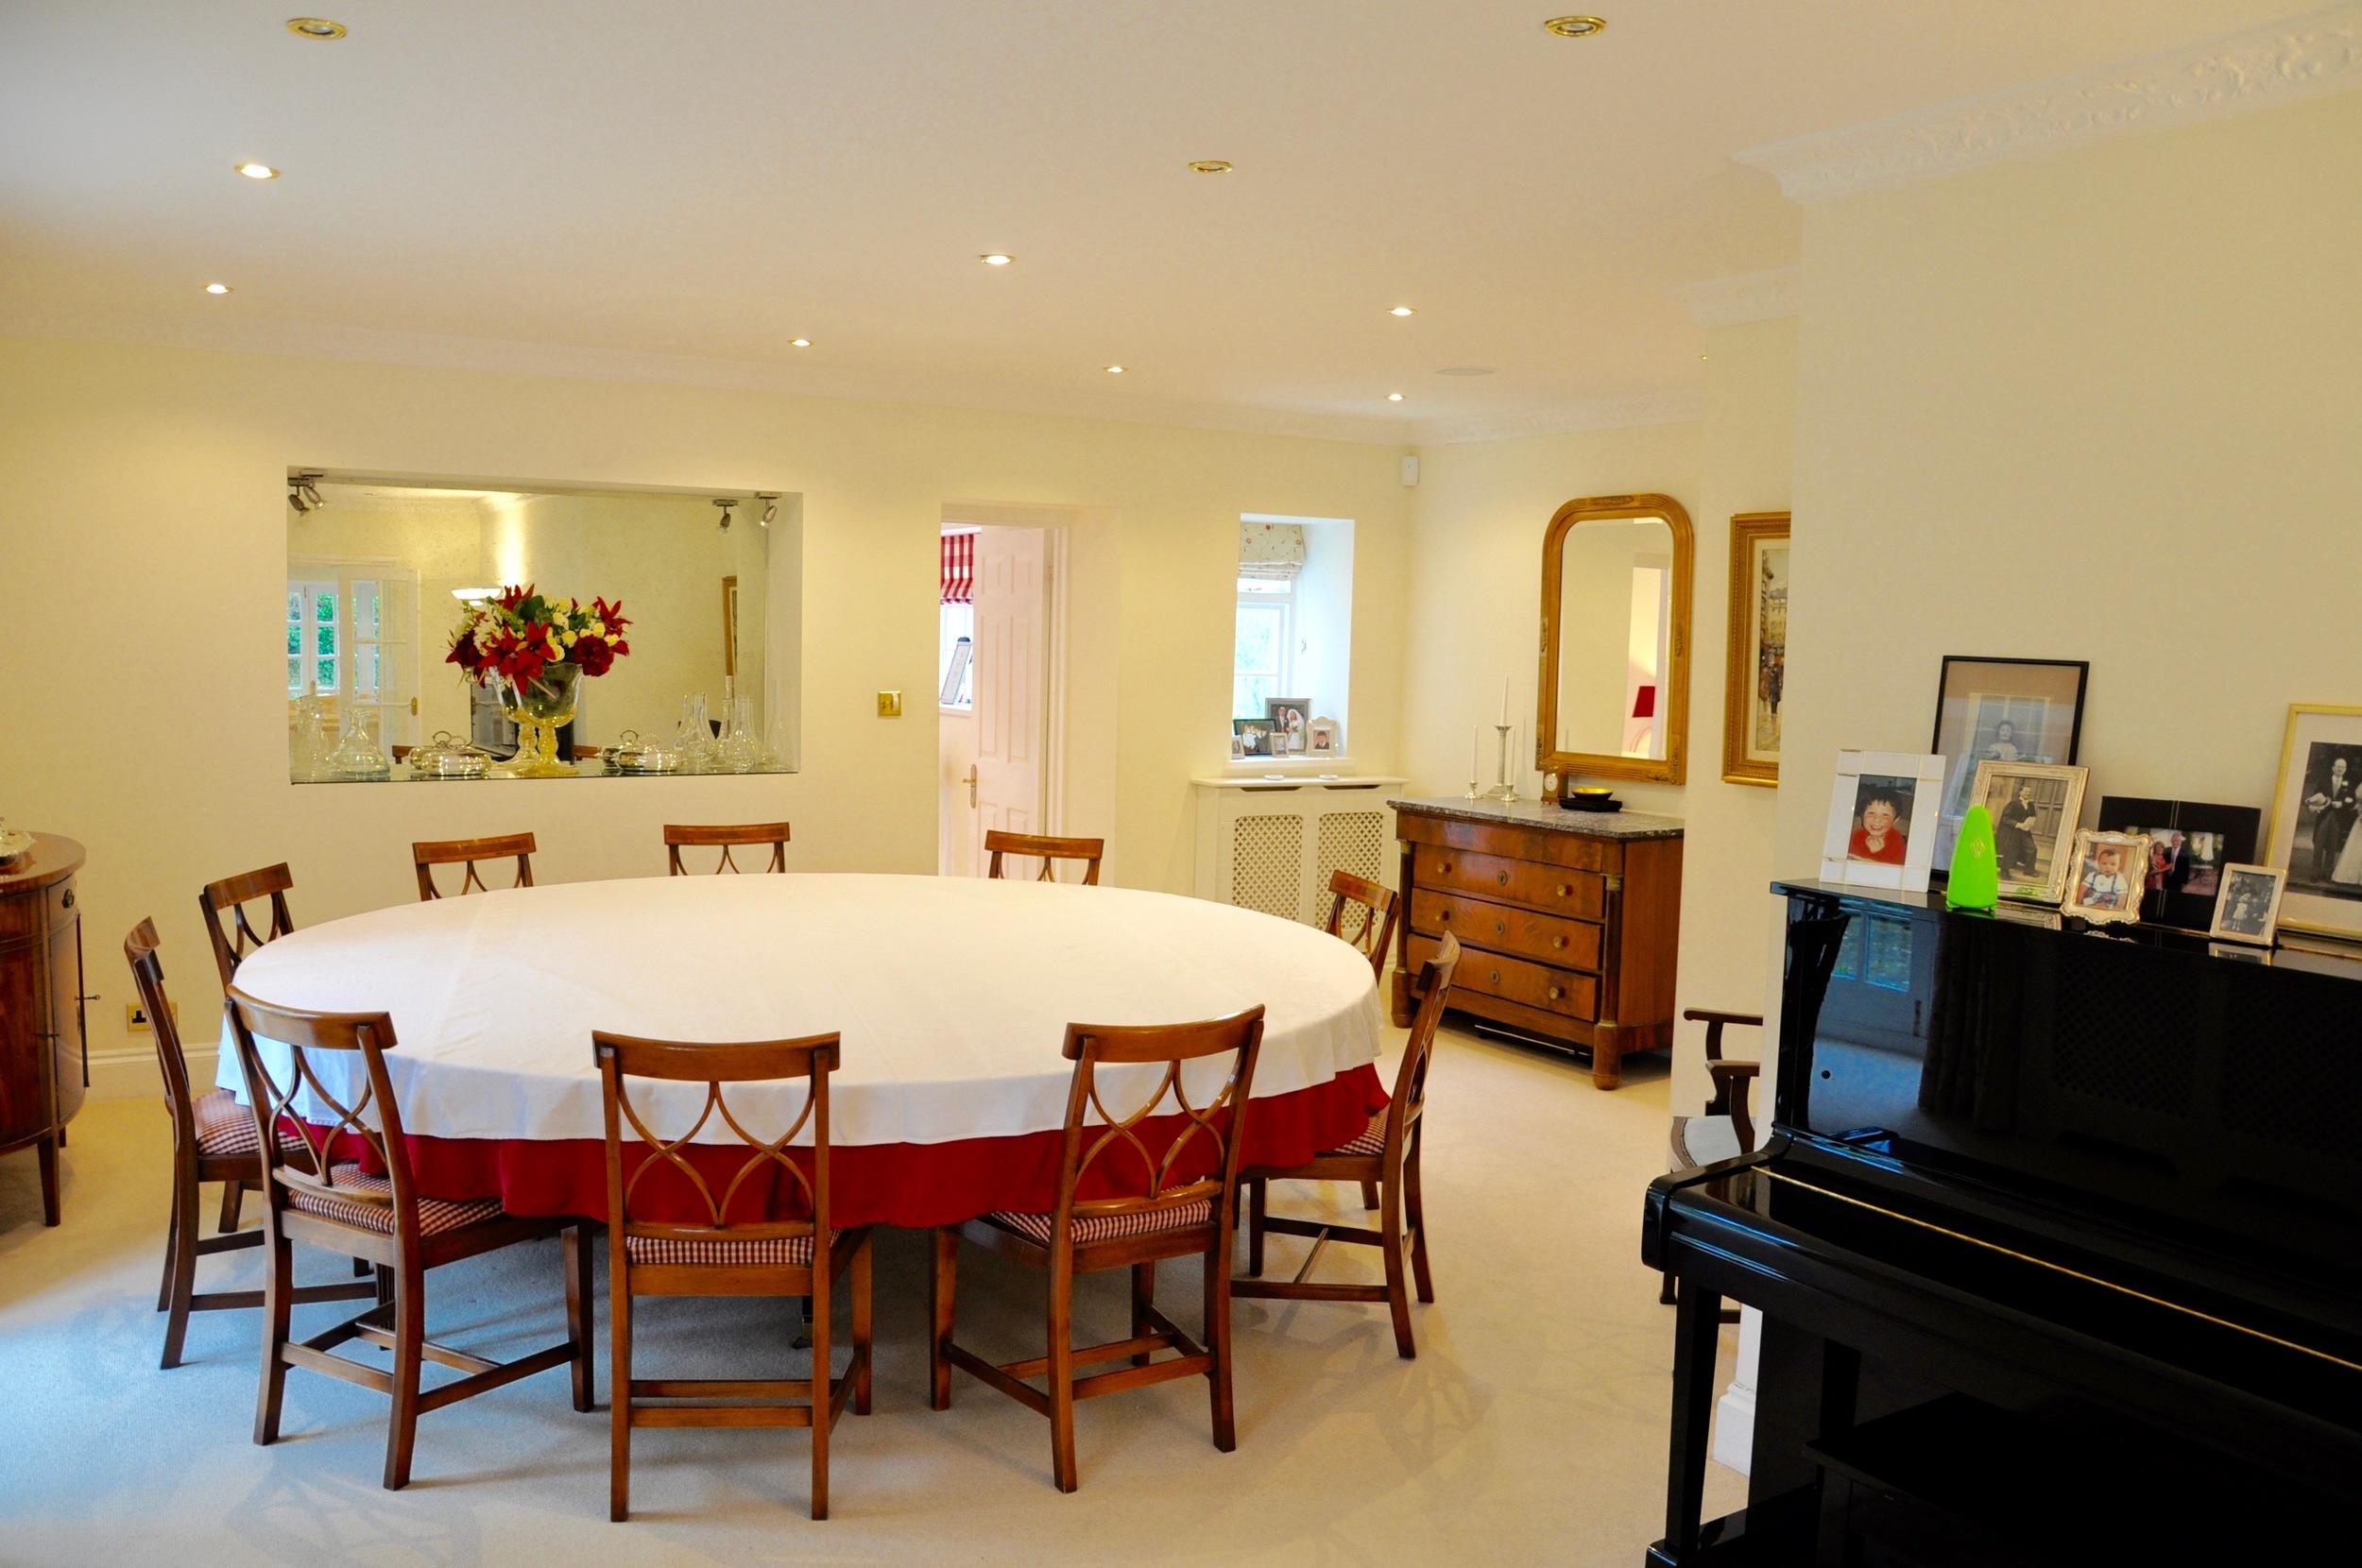 Dining room at Beggars Barn - seat 16